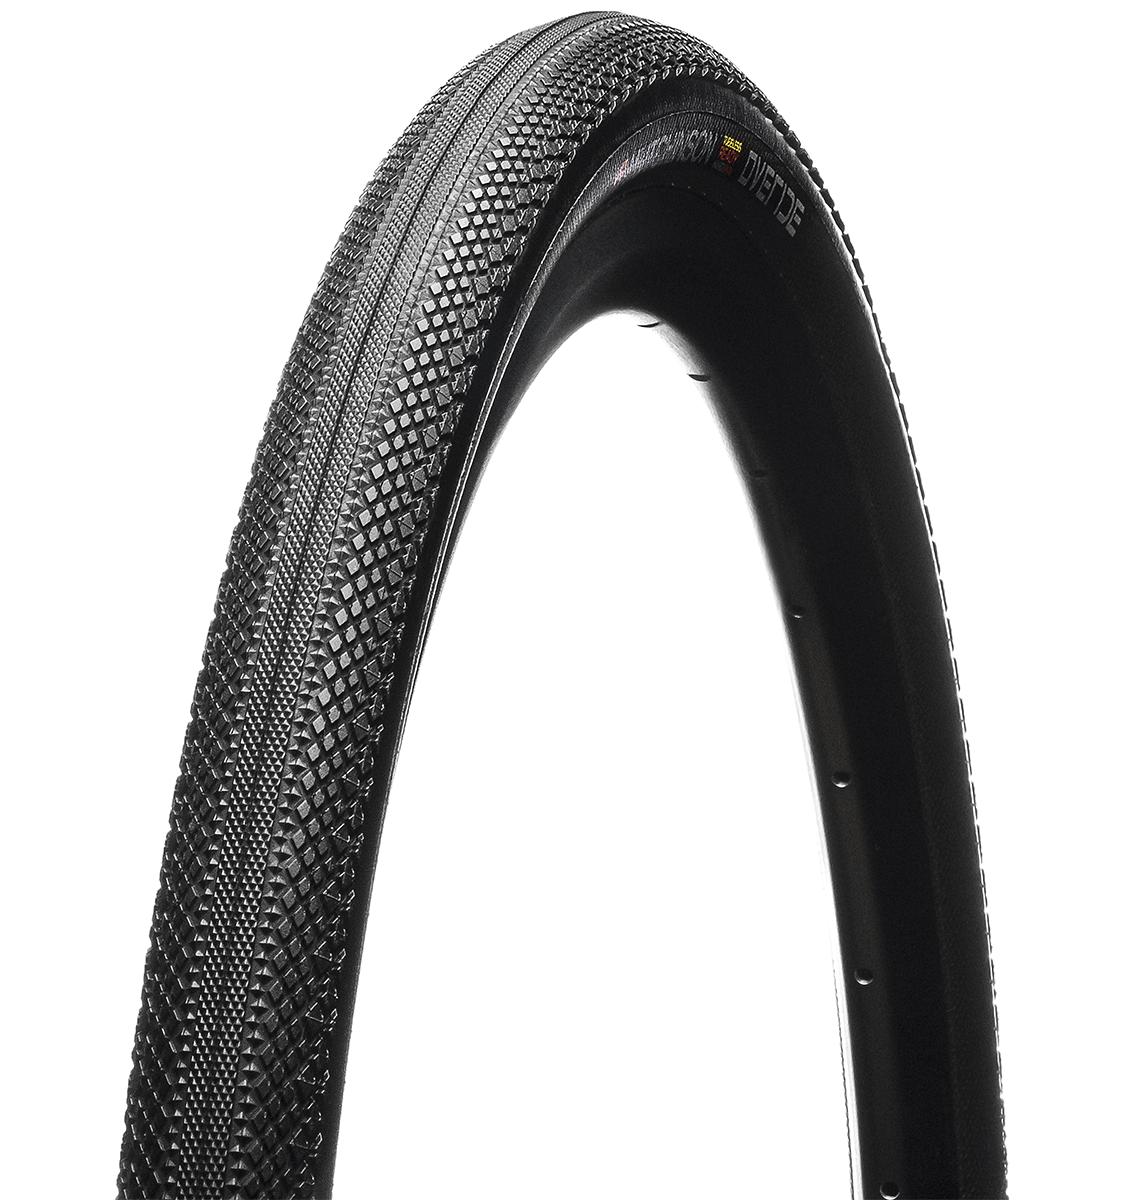 gravel-bike-tire-hutchinson-overide-1